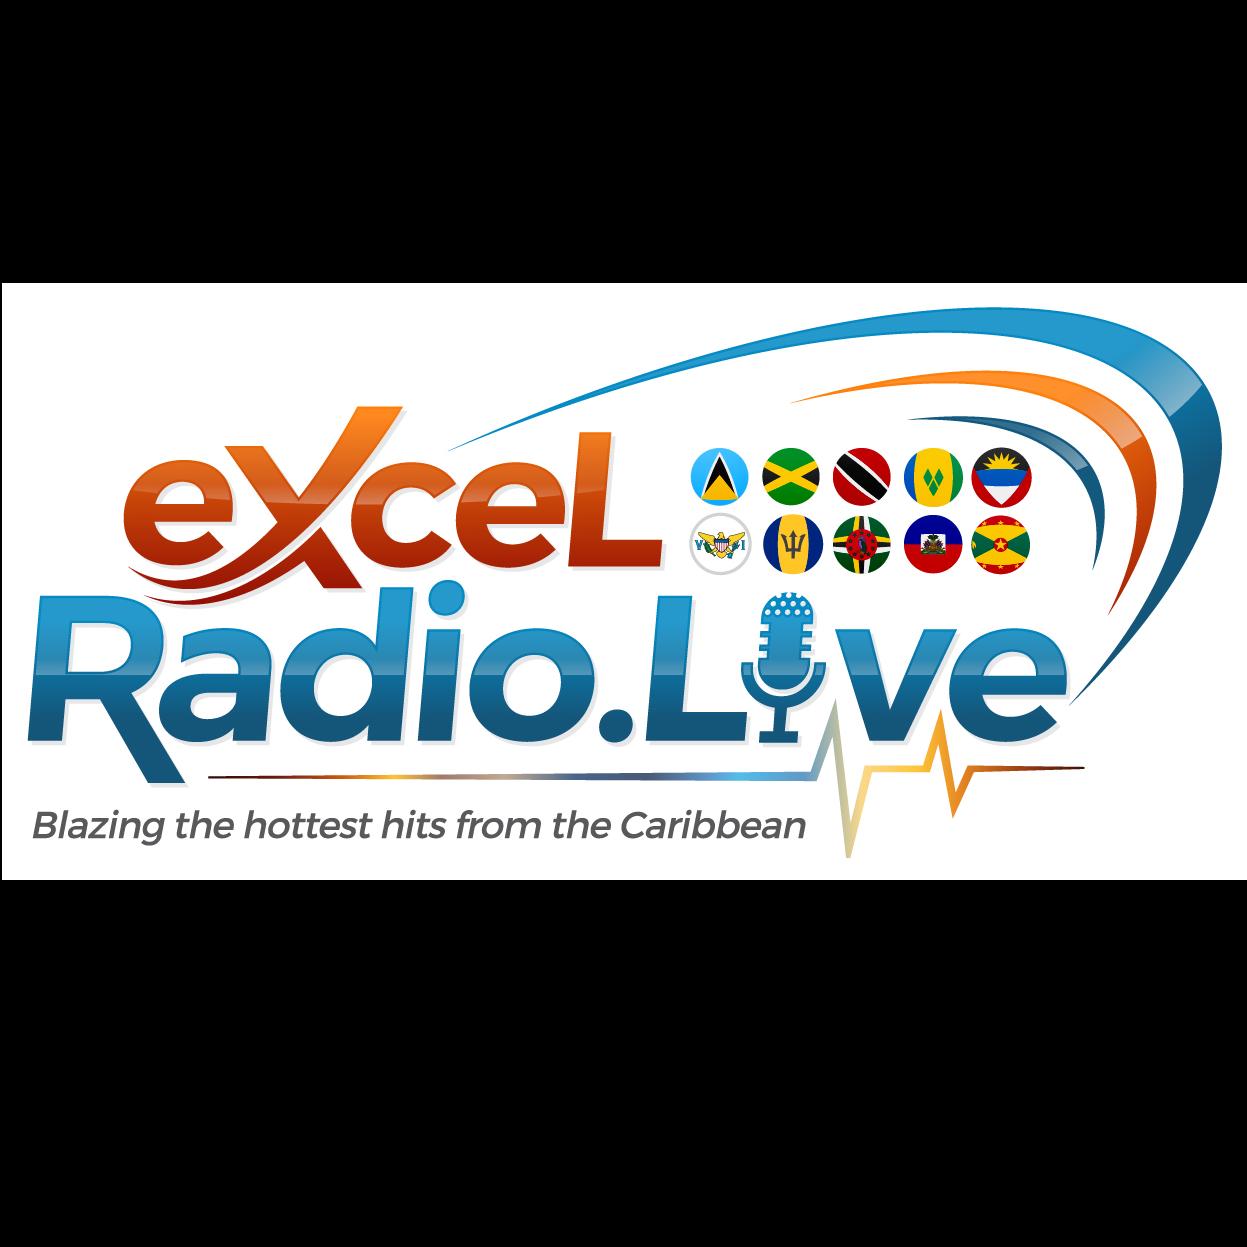 ExcelRadio.Live